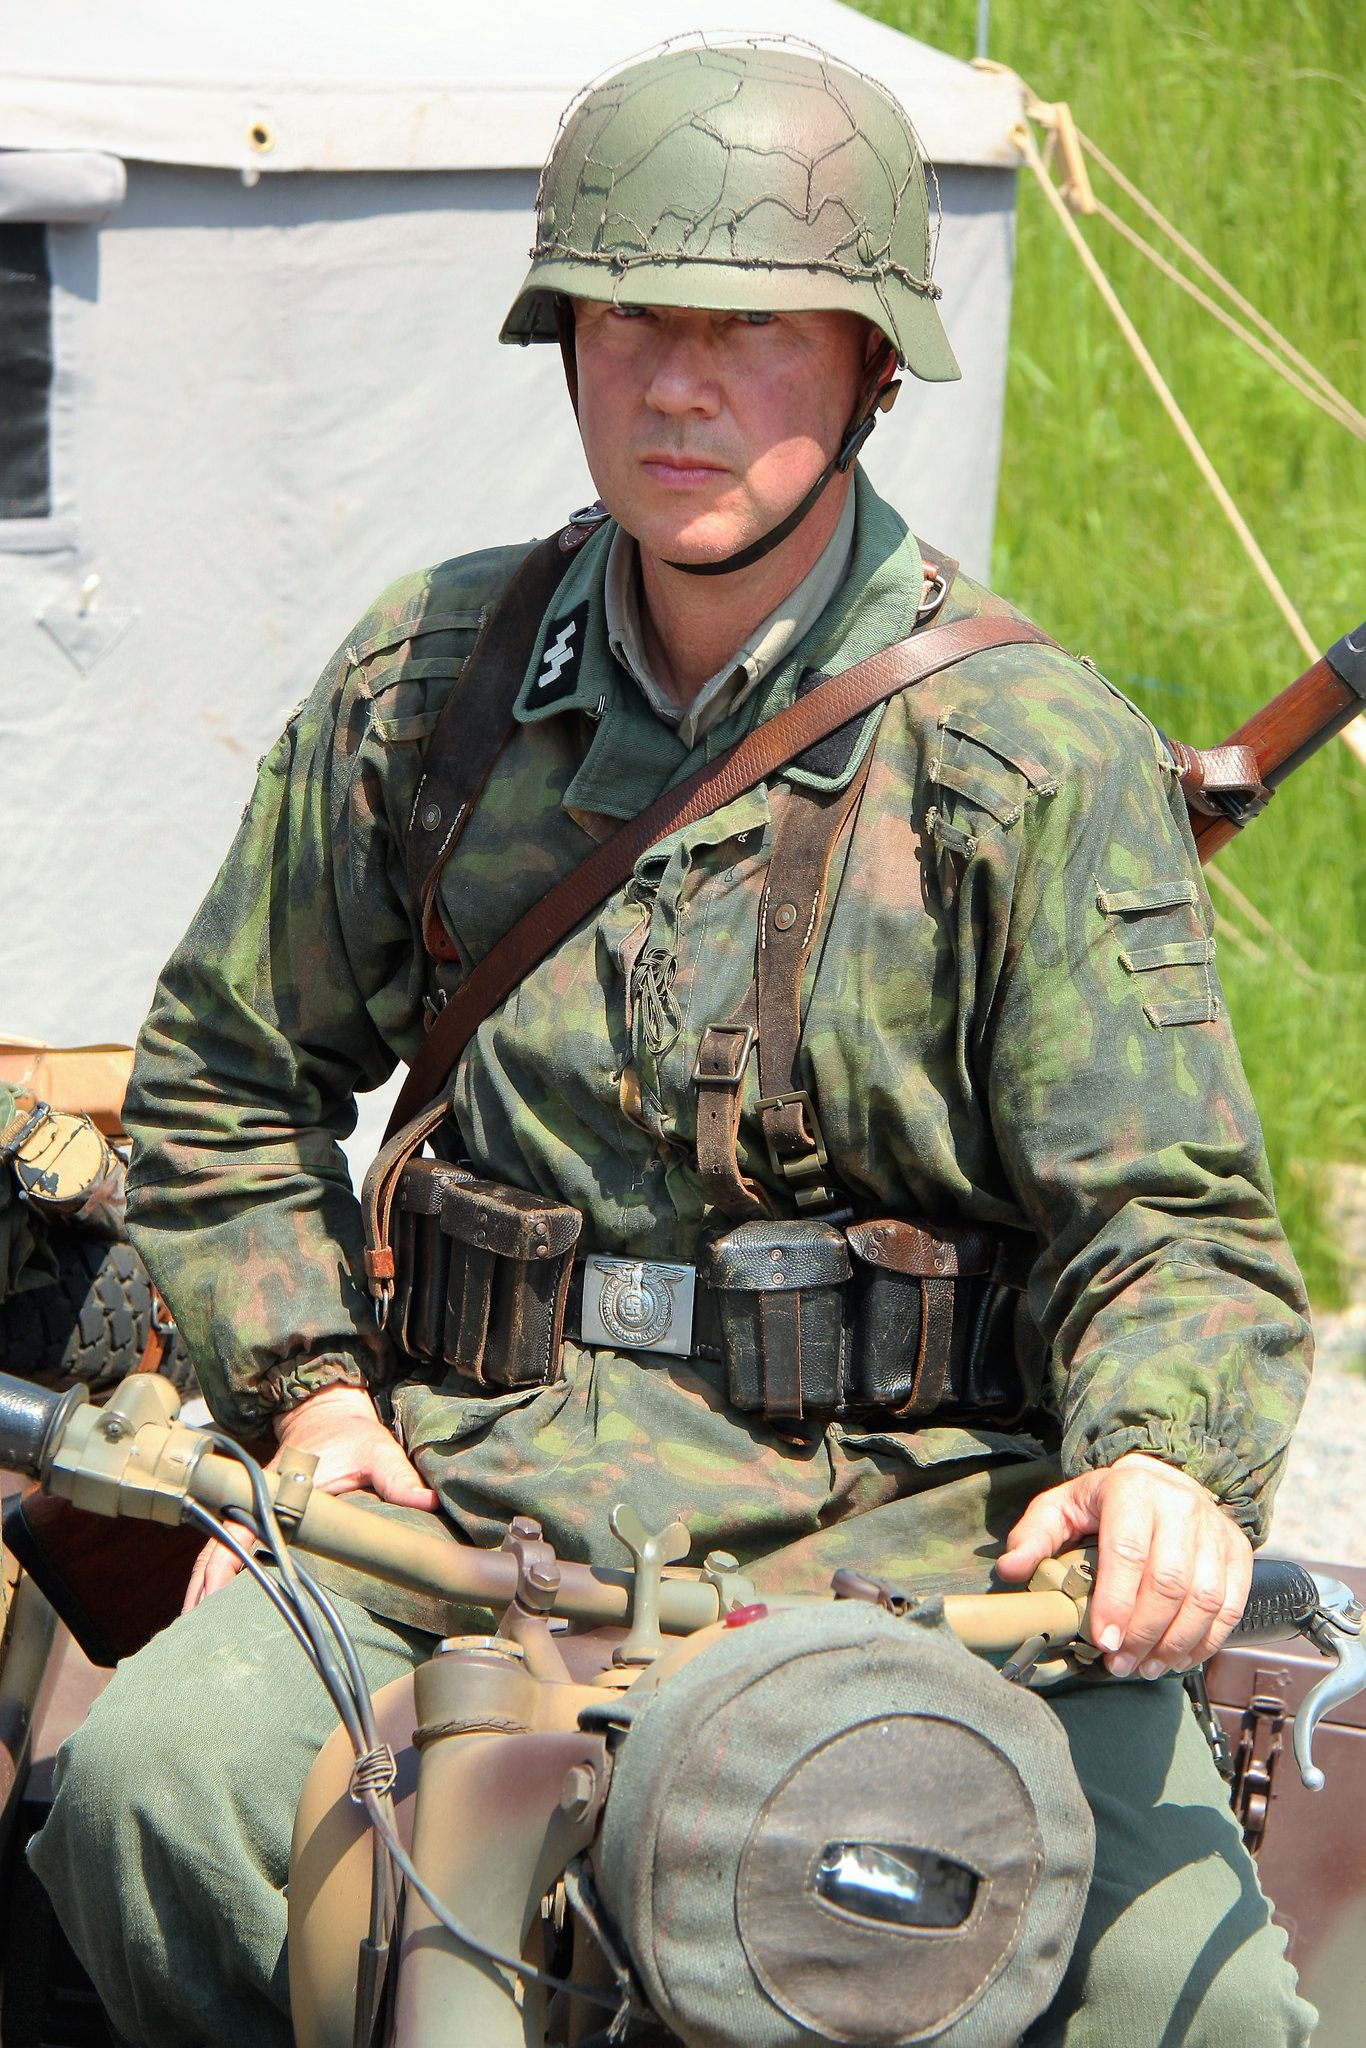 German World War 2 Reenactment Uniforms - Year of Clean Water